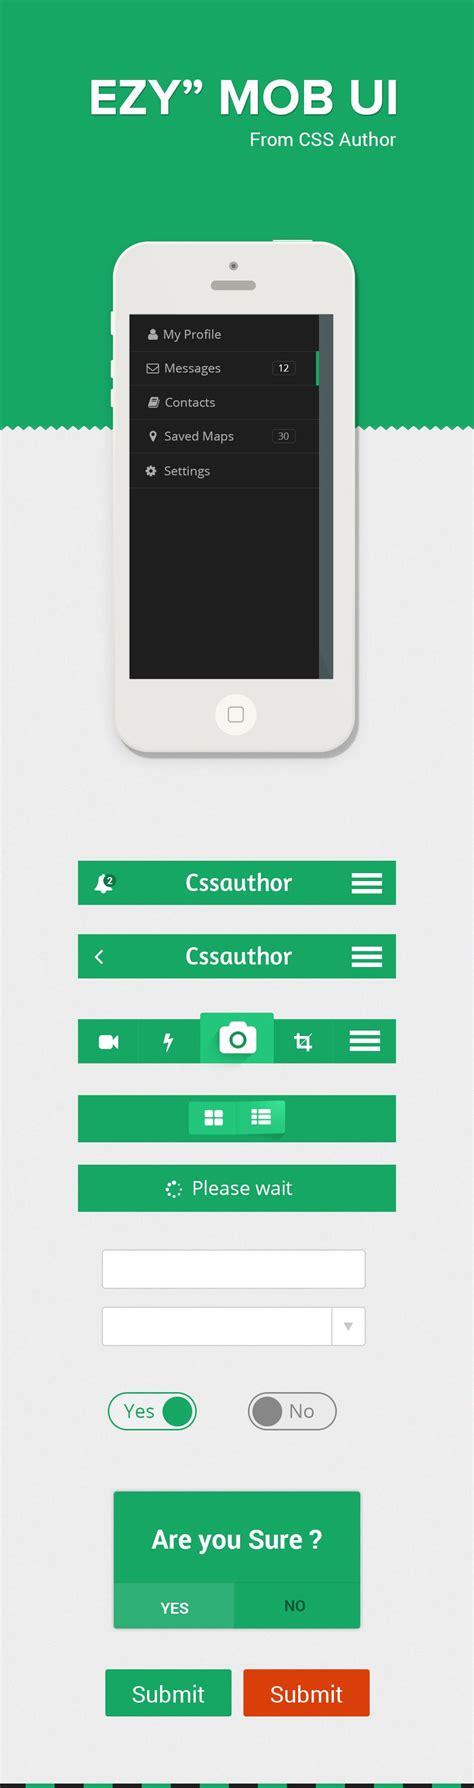 mobile user interface design ezy a free mobile ui design kit psd 187 css author